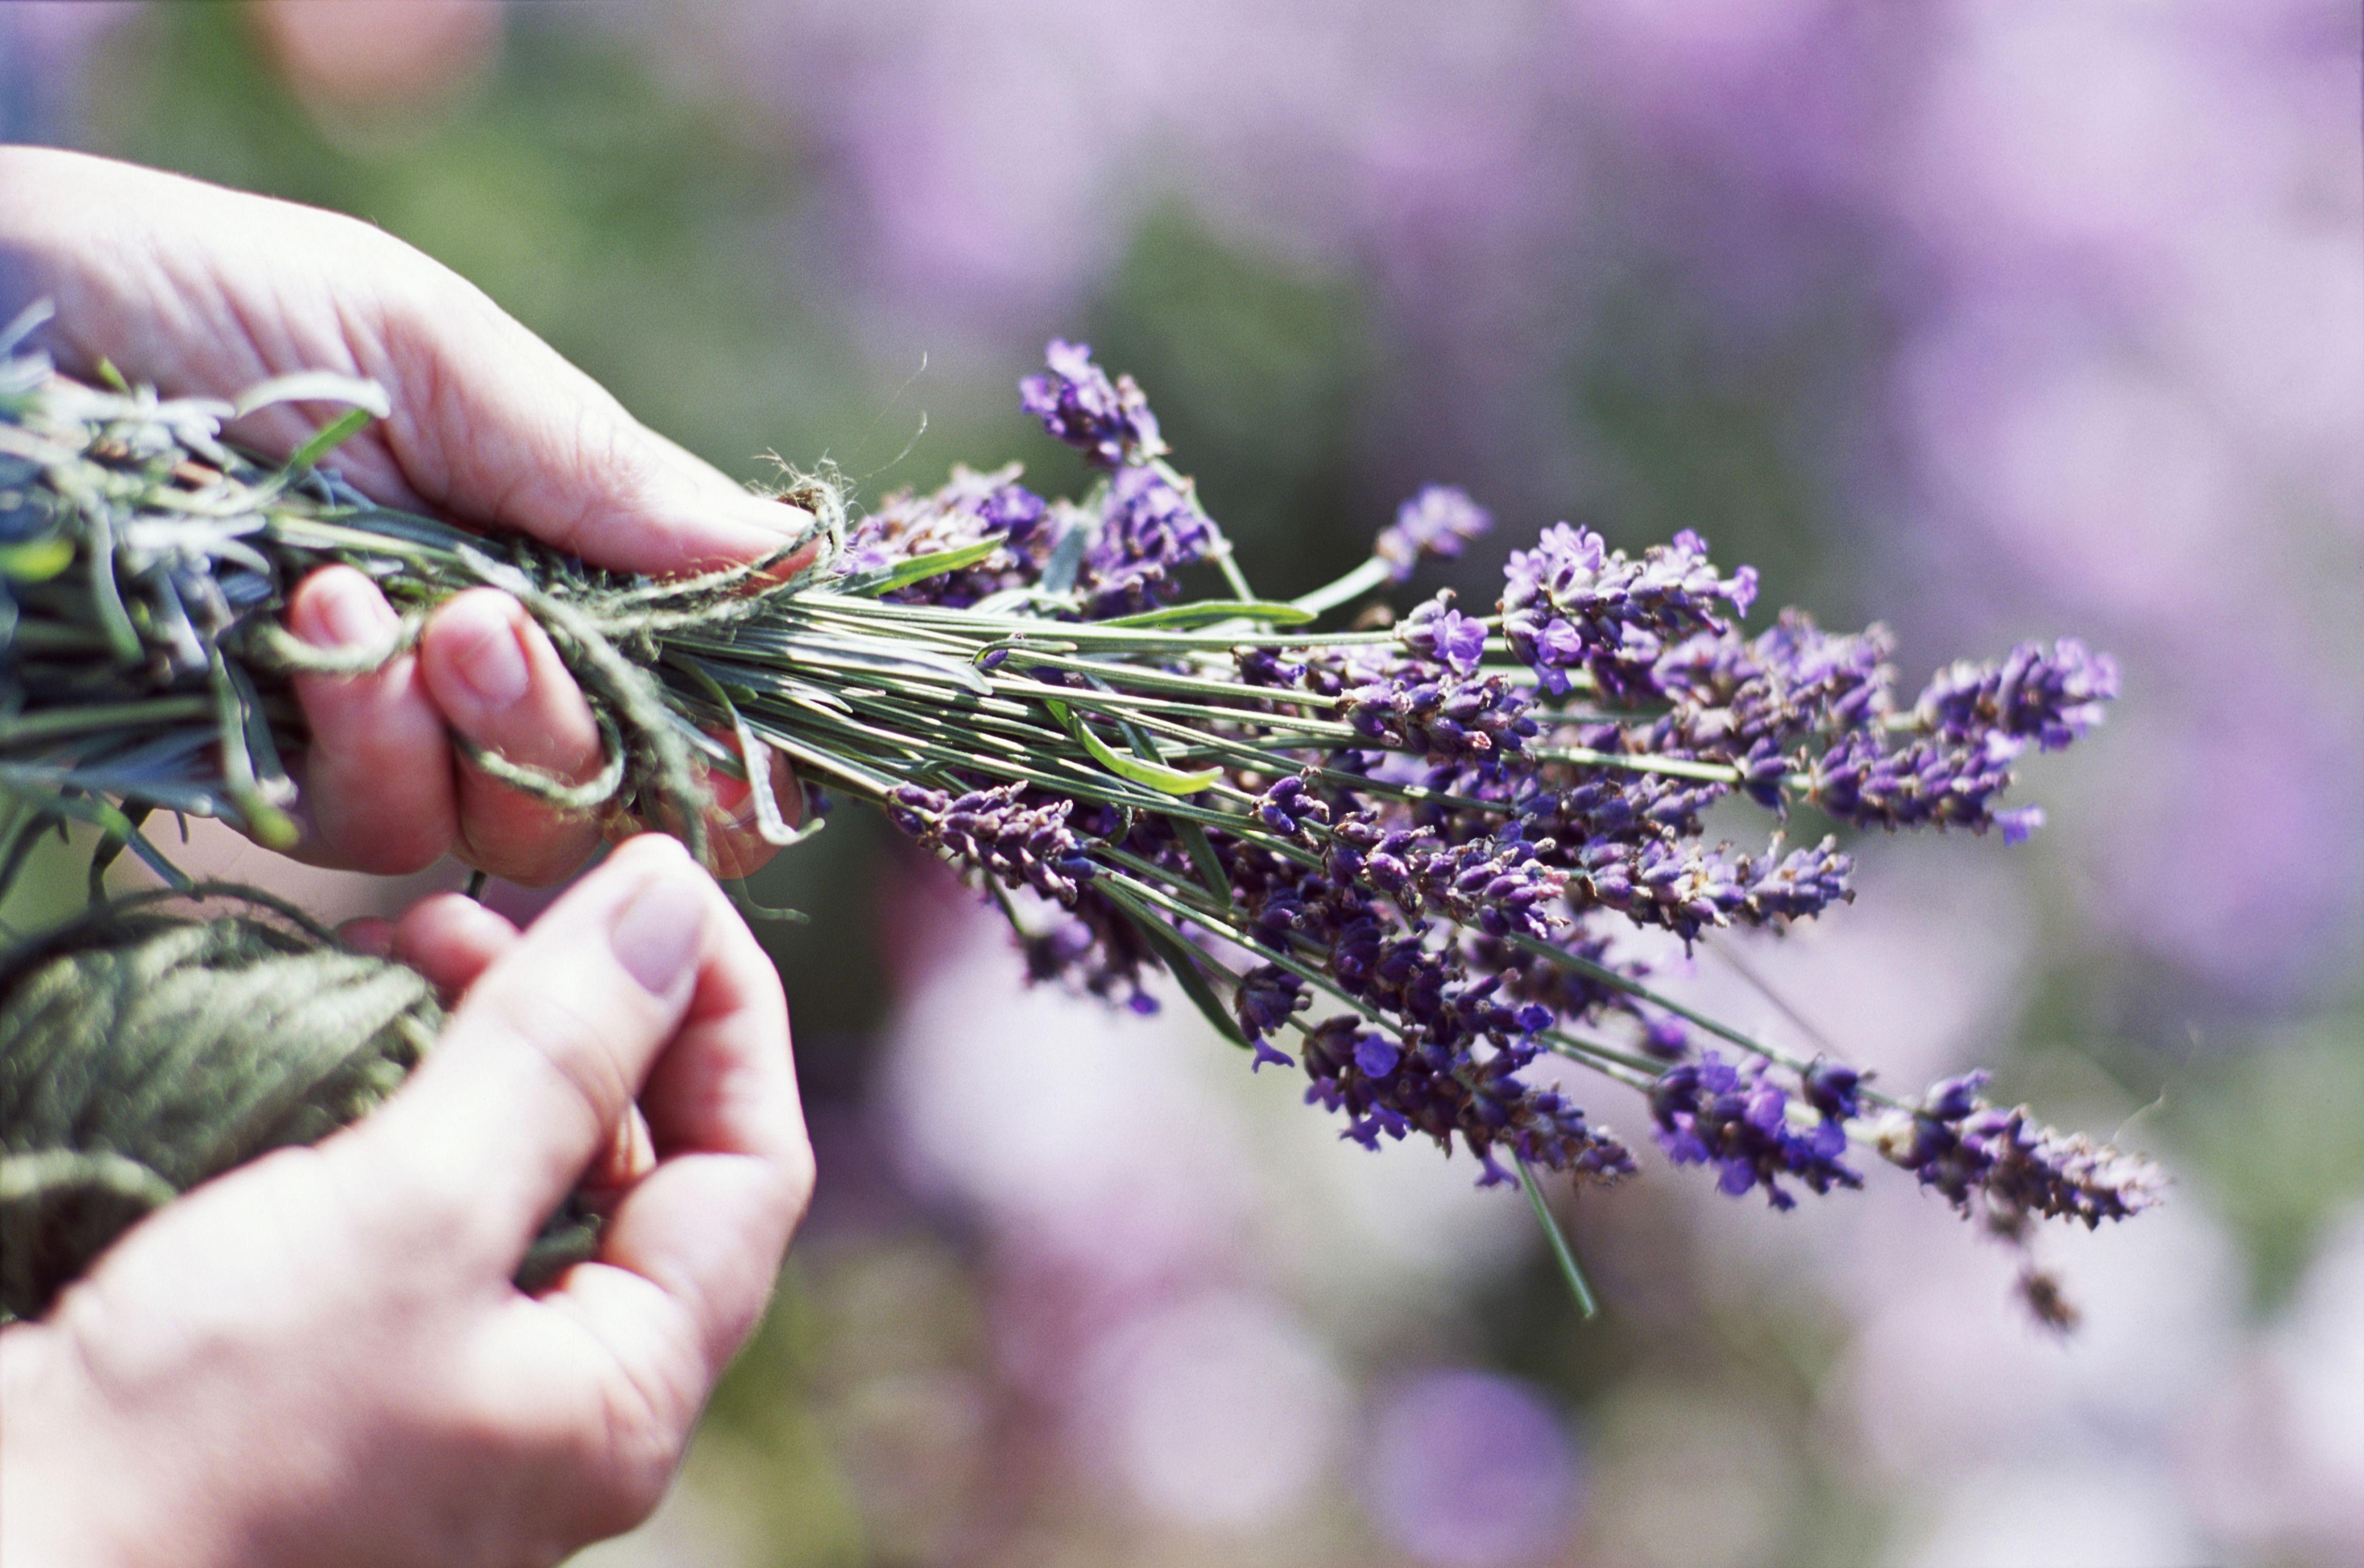 Hand tied bunch of cut Lavender (Lavandula)